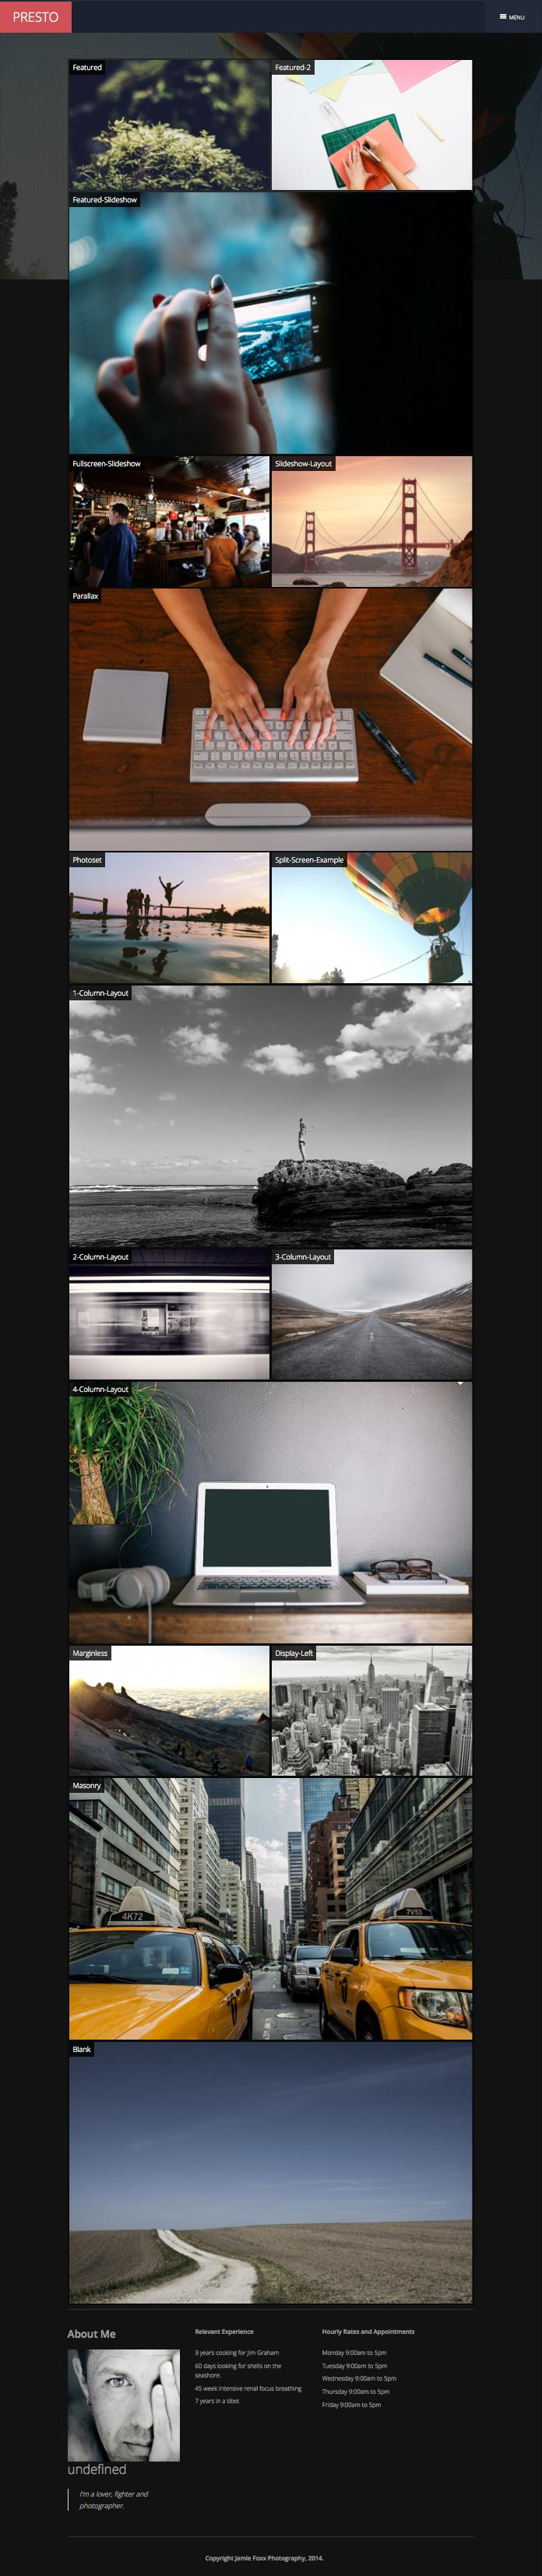 presto joomla ajax based drag drop gallery template. Black Bedroom Furniture Sets. Home Design Ideas